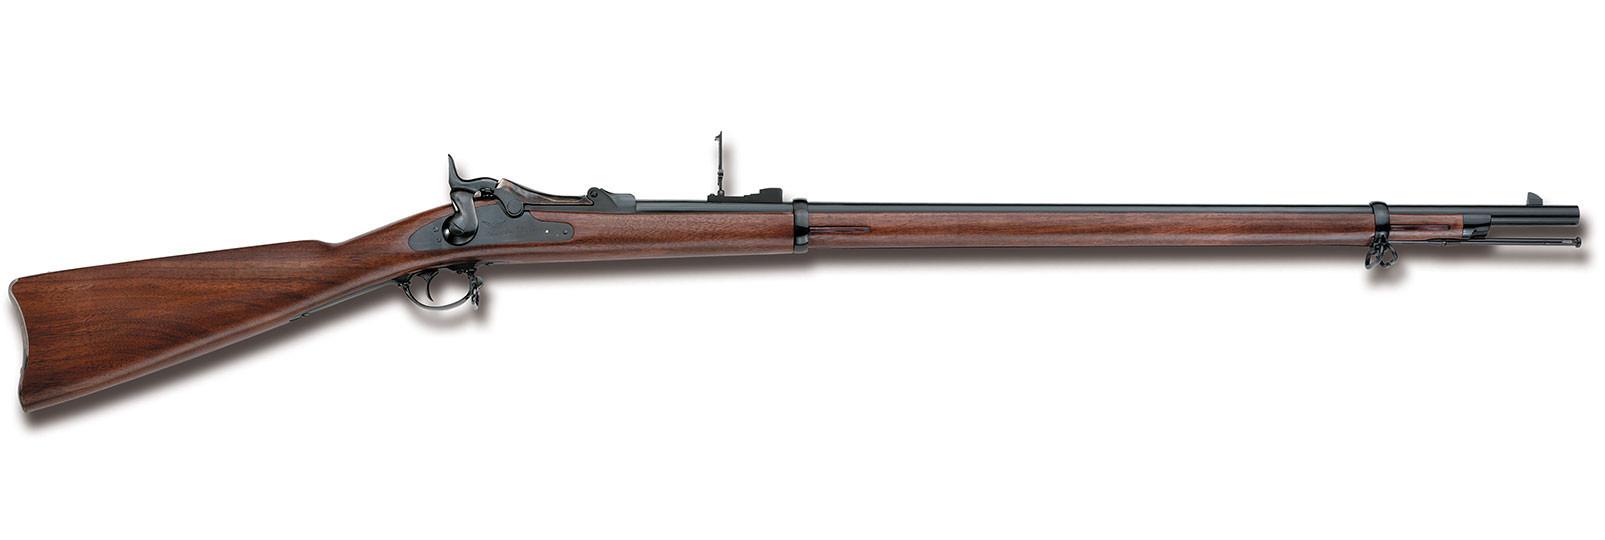 "Springfield Trapdoor Rifle 32"""